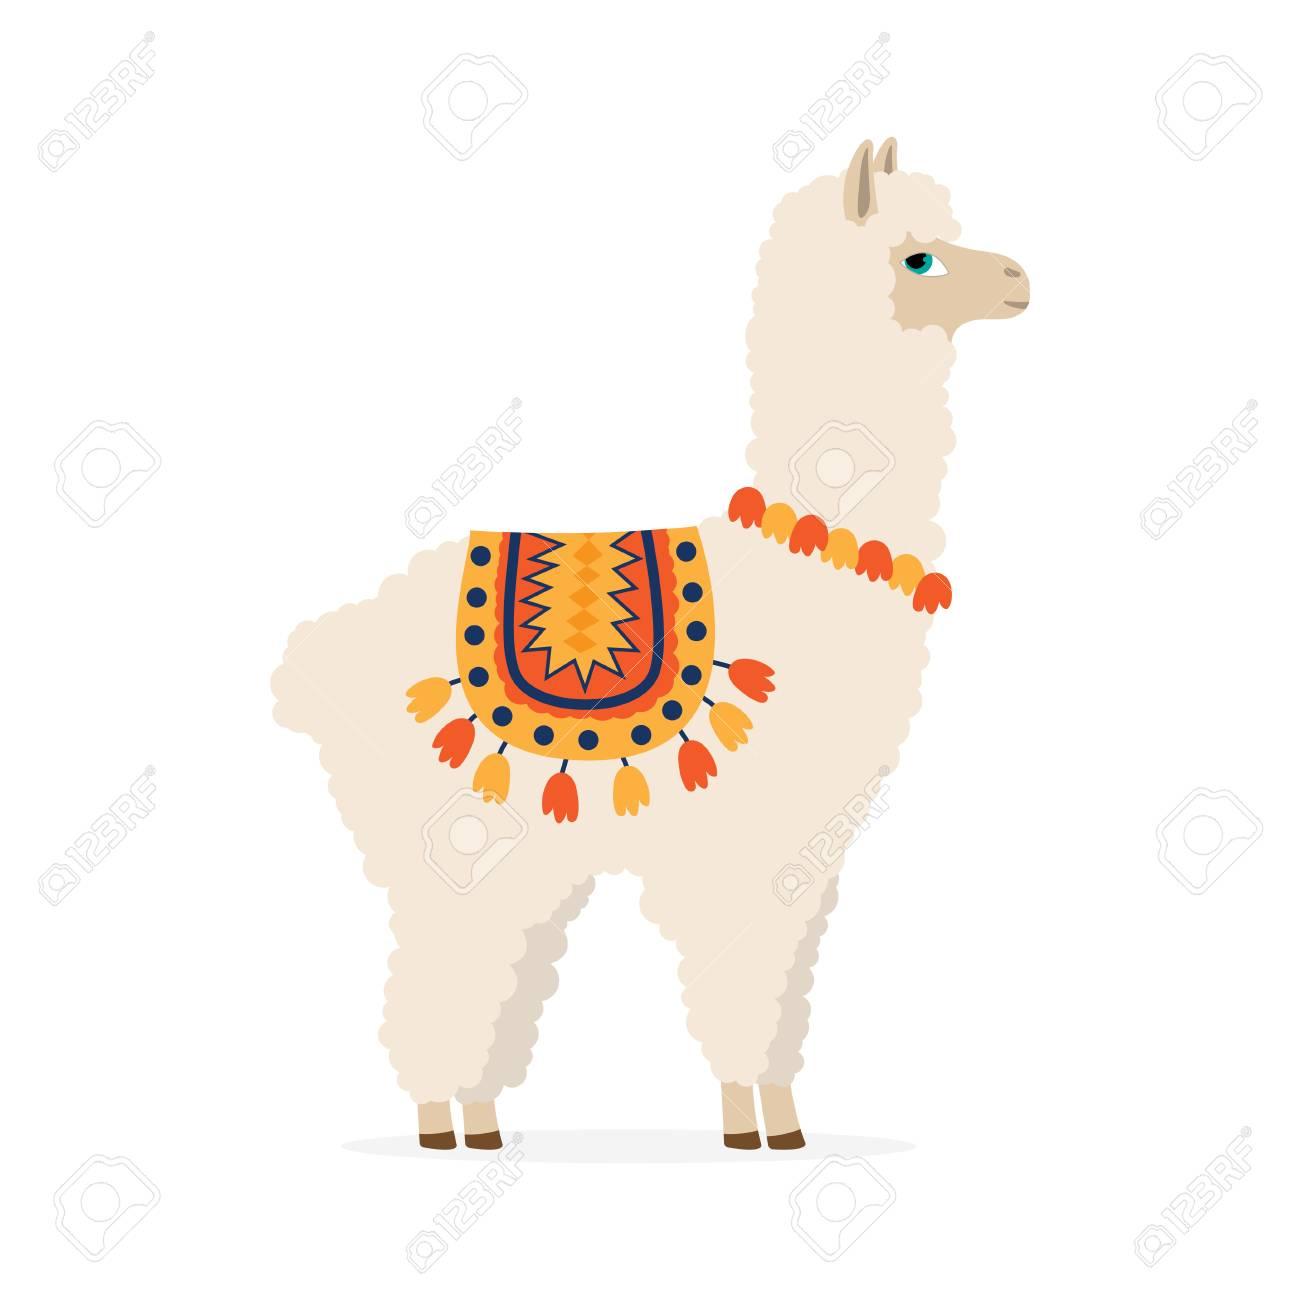 Cute Drawn Llama Or Alpaca Funny Animal Vector Illustration